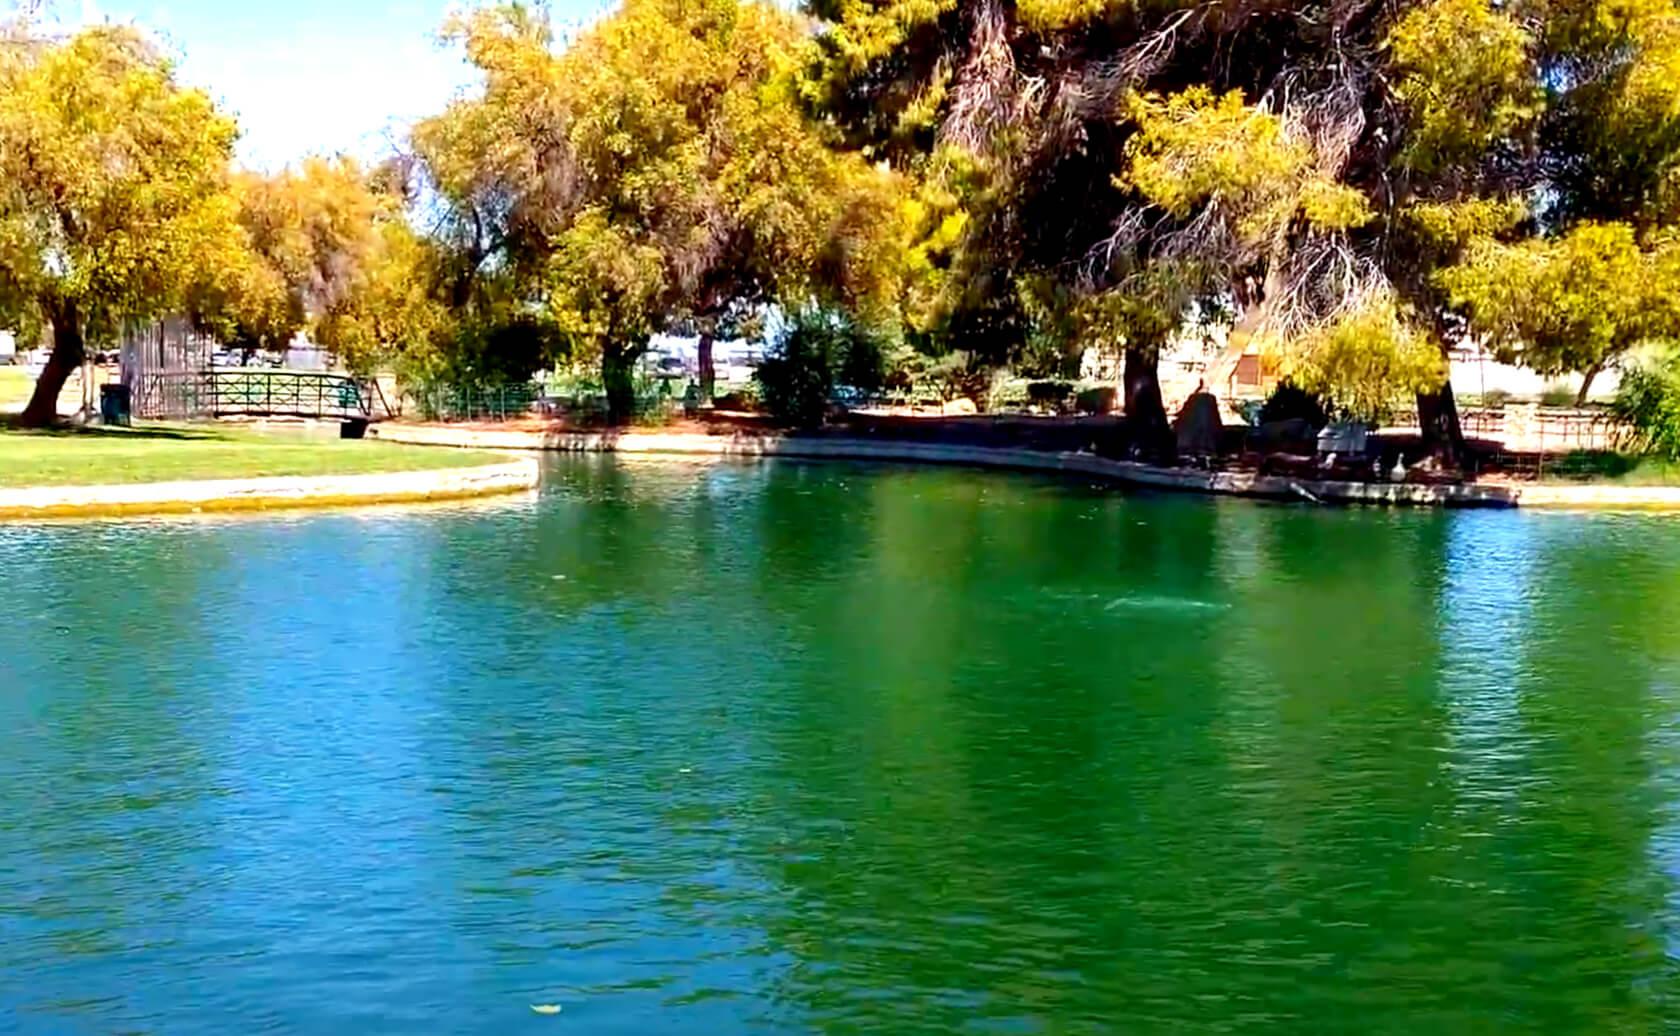 Bonsall-Pond-Lake-Fishing-Guide-Report-Glendale-AZ-03